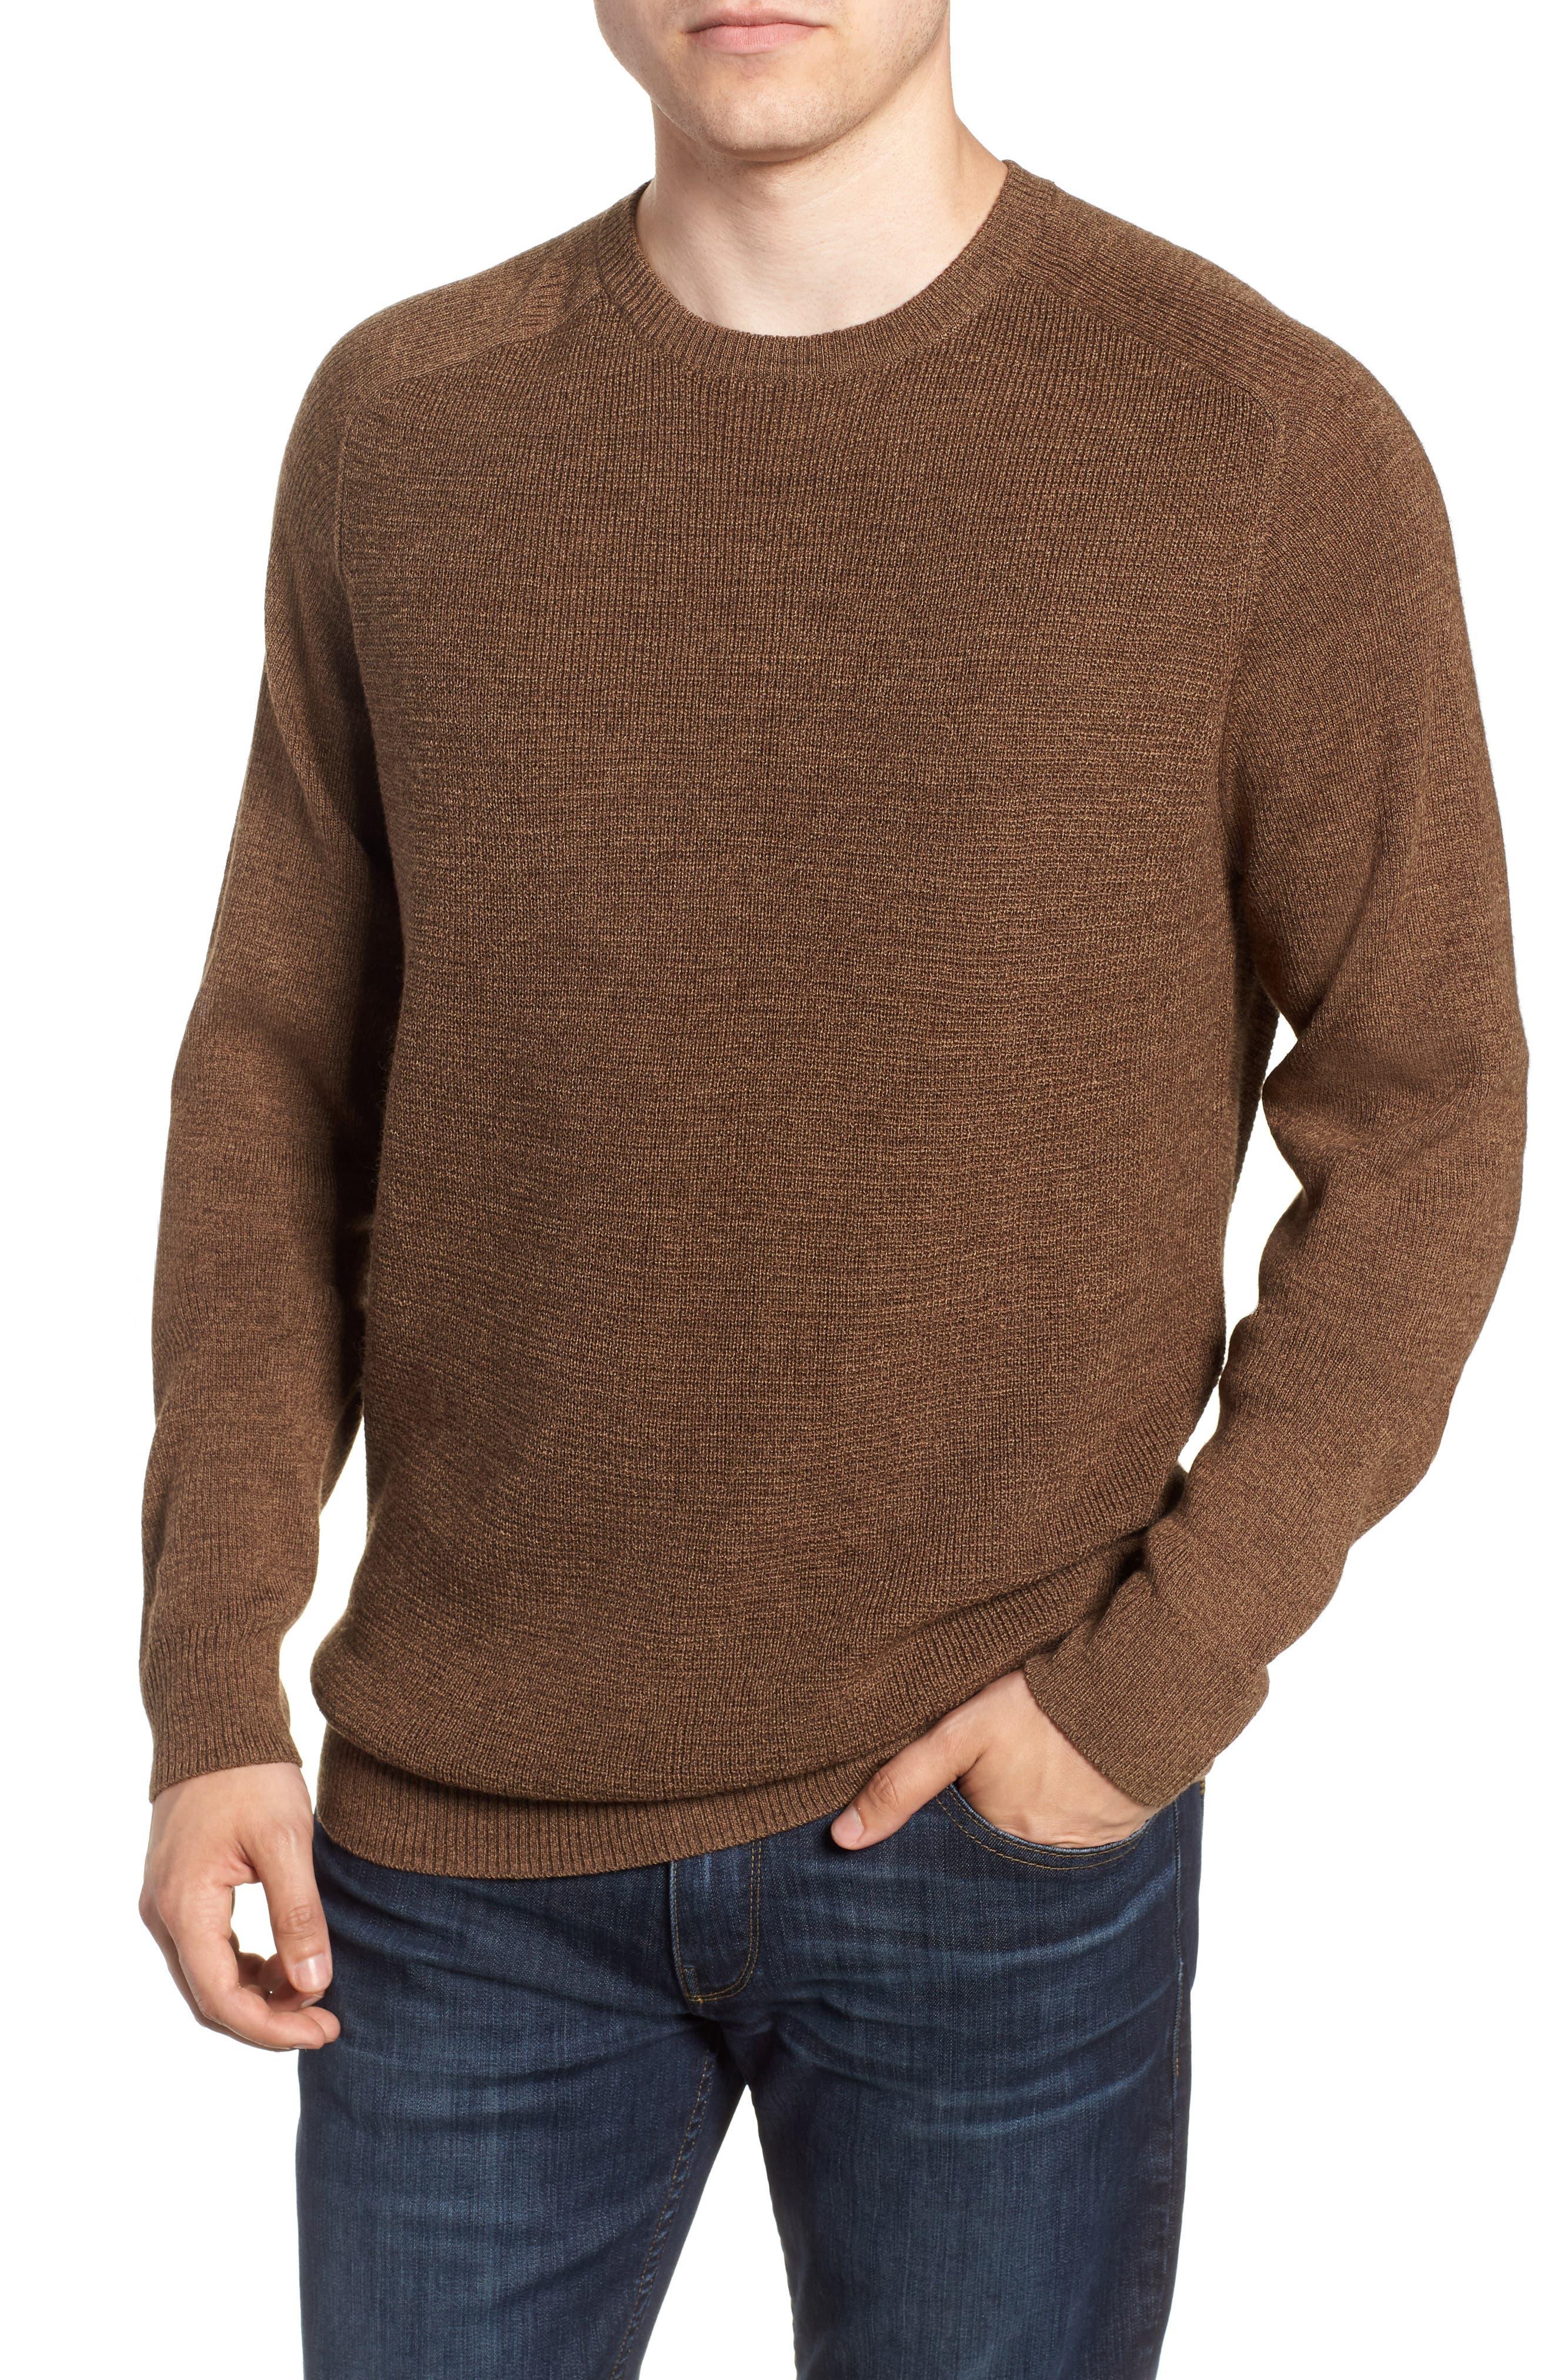 Crewneck Wool Blend Sweater,                         Main,                         color, BROWN MAJOR